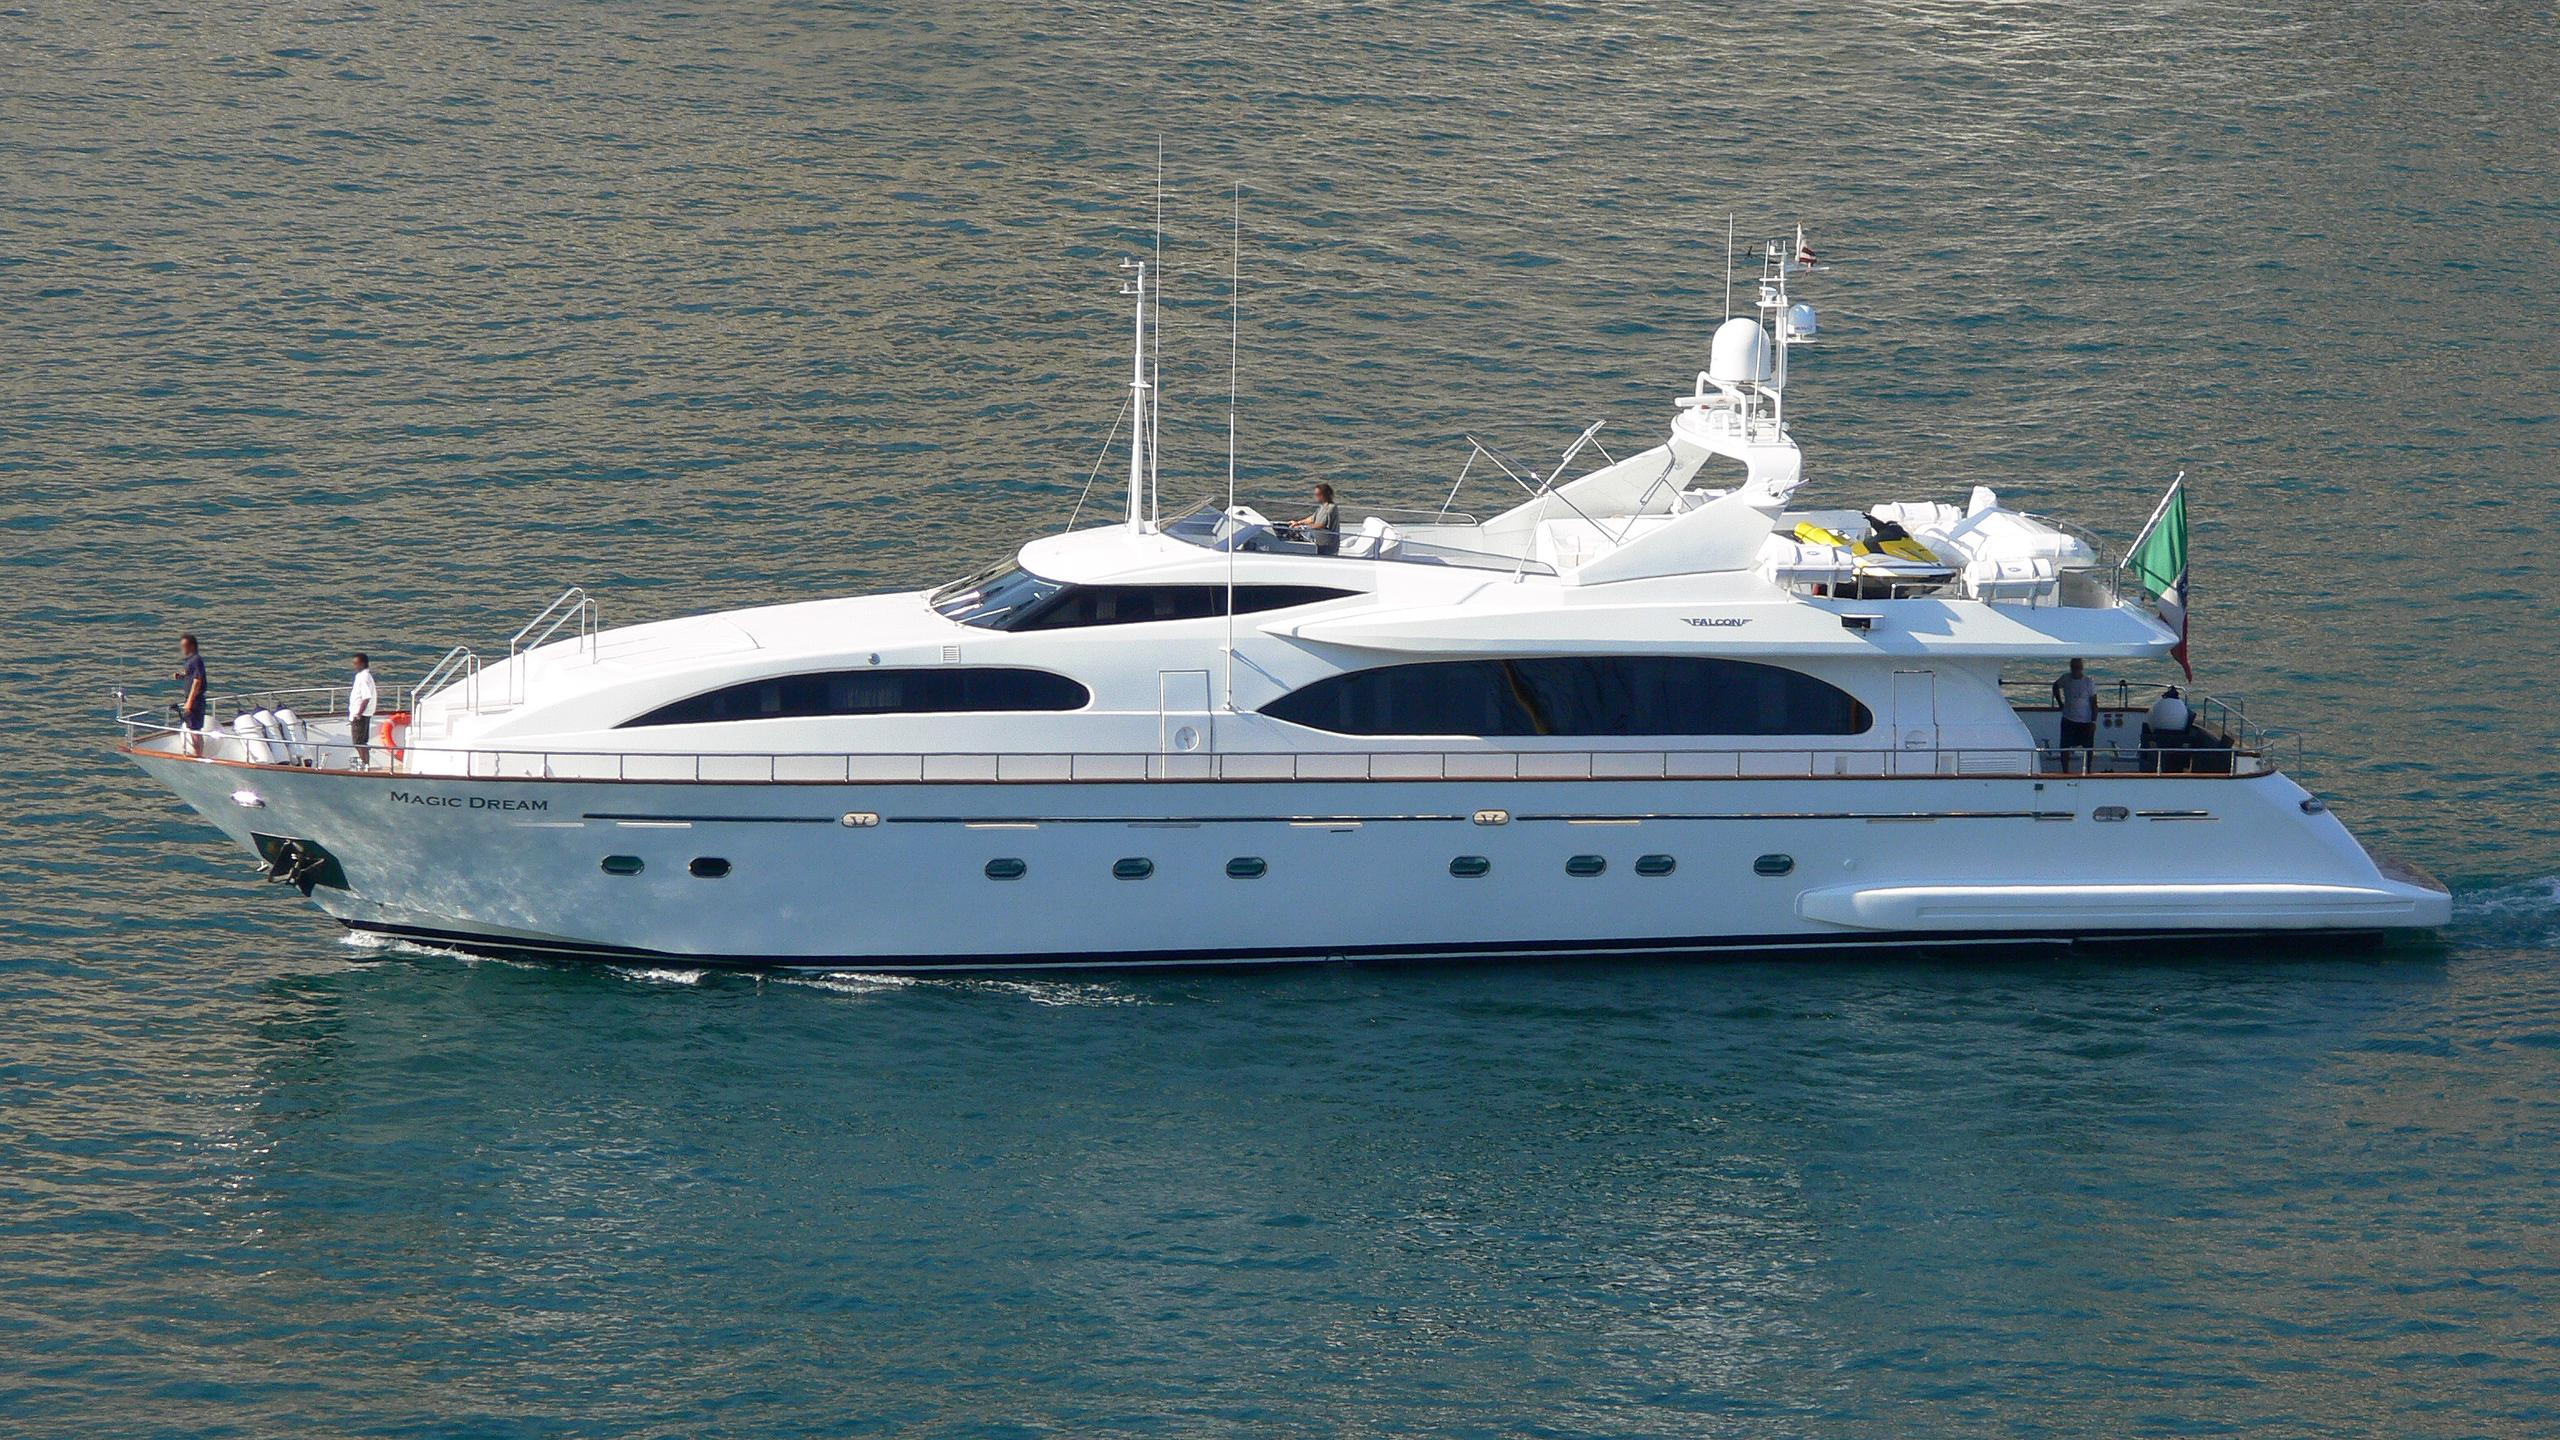 magic-dream-yacht-exterior